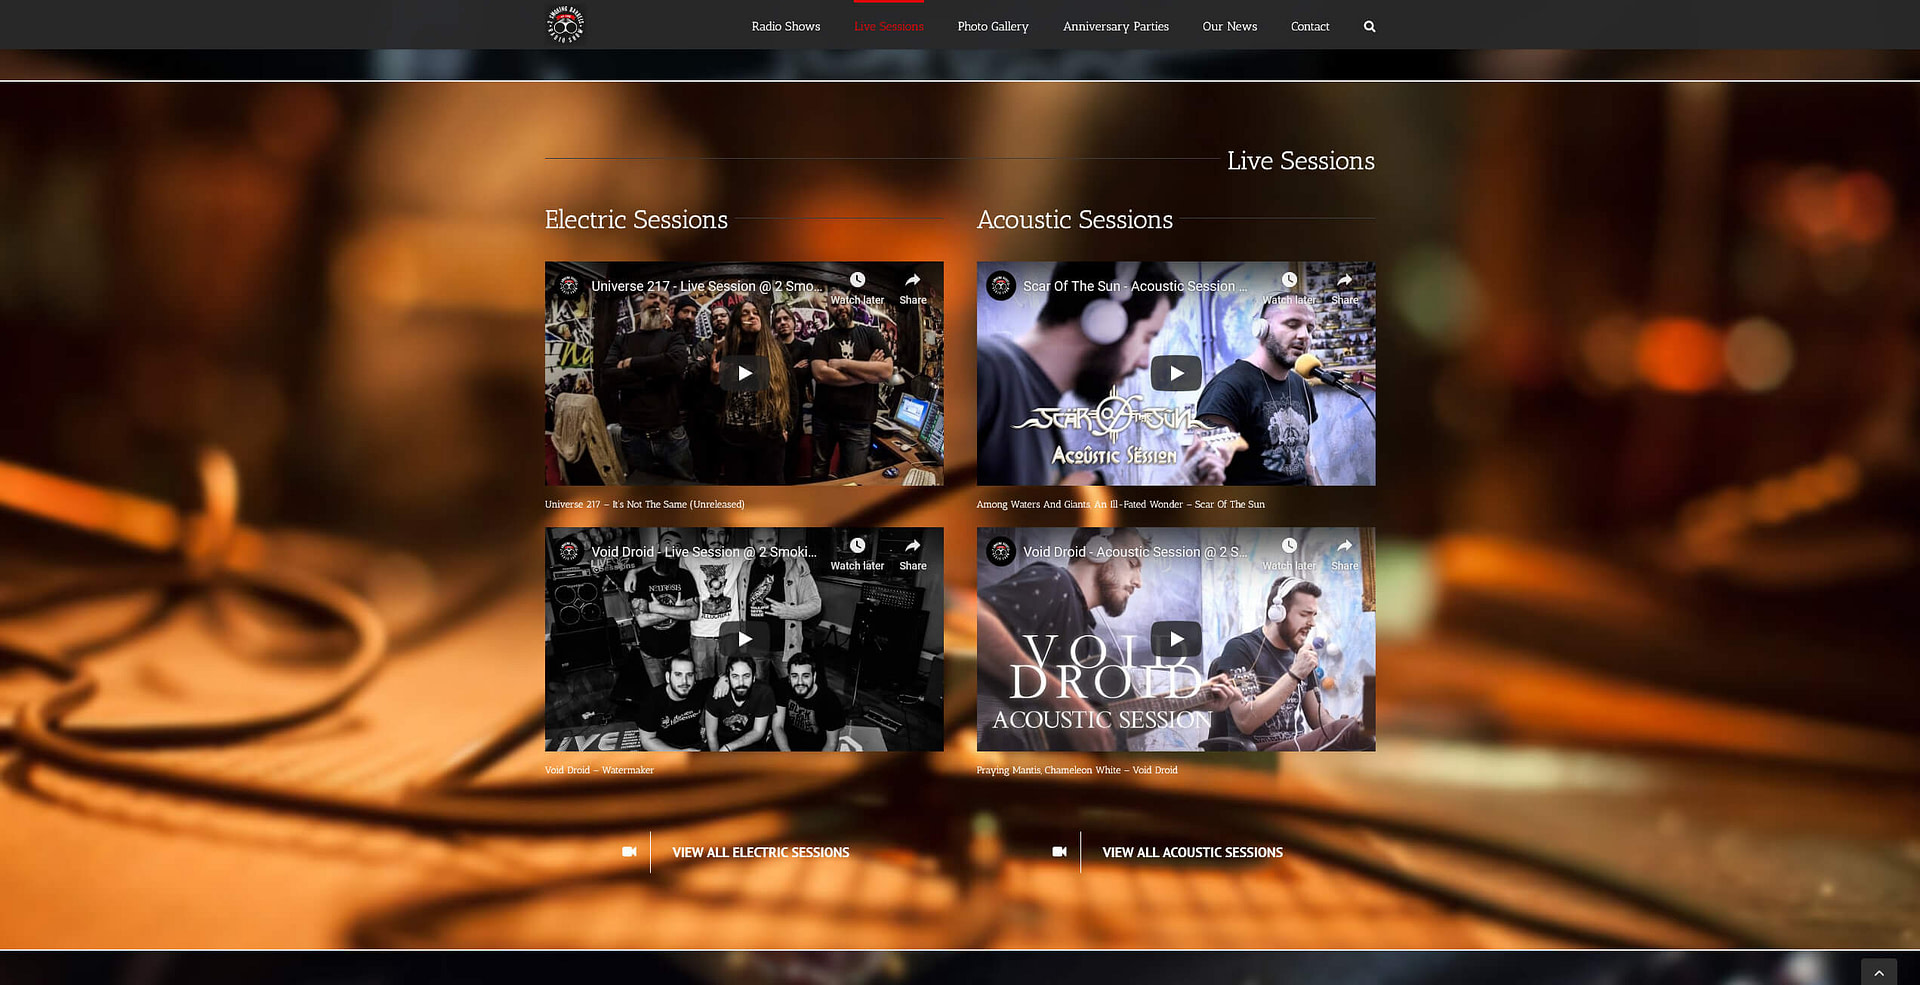 2 Smoking Barrels - TMY WEB Development